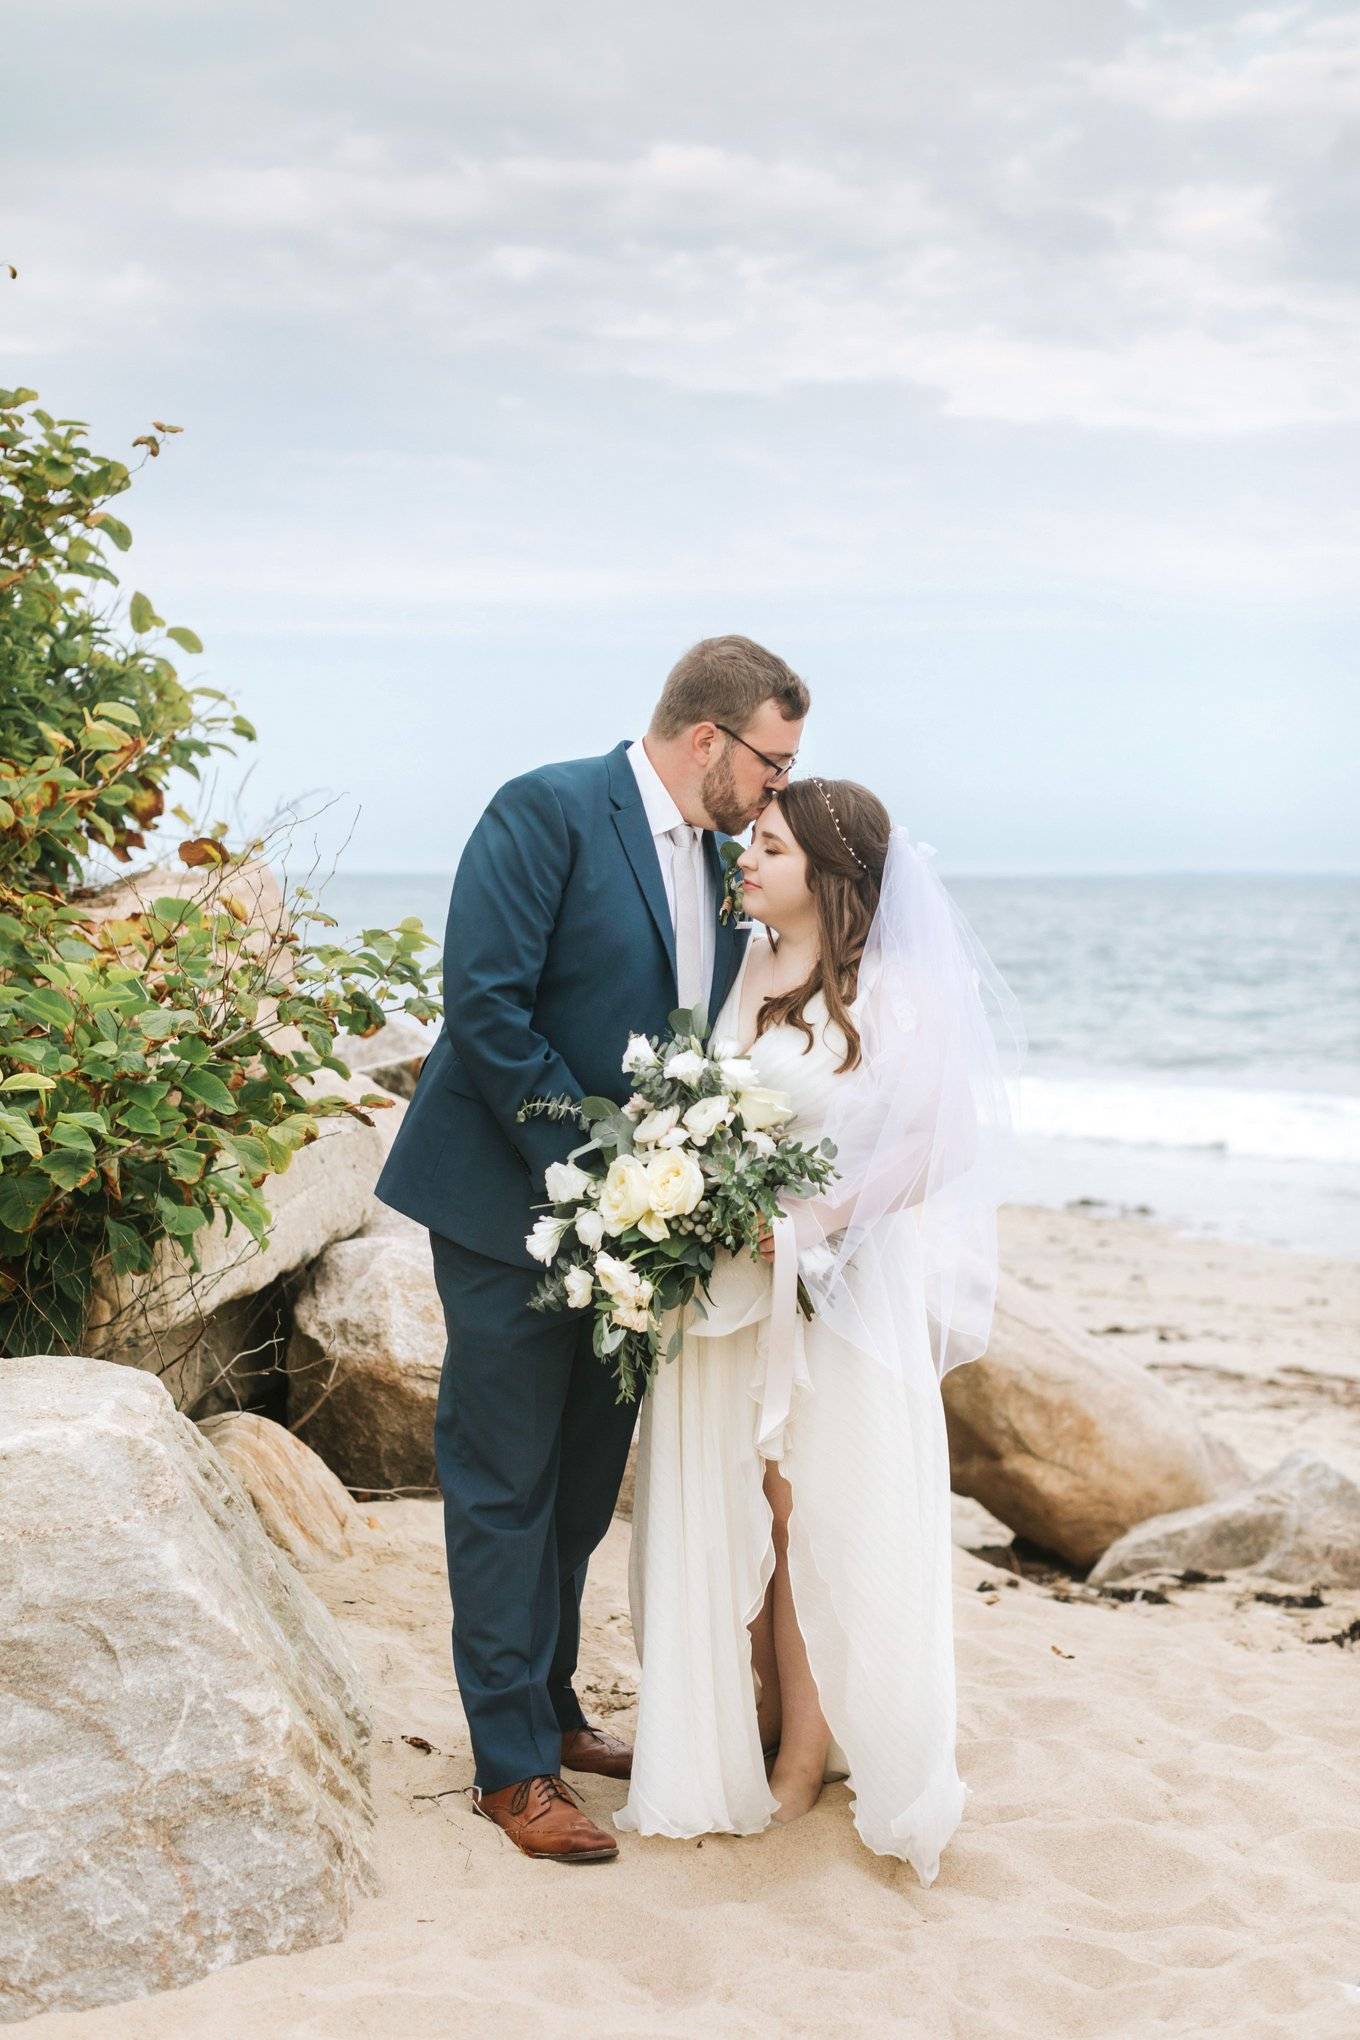 Newport-Wedding-Backyard-Photographer-25.jpg